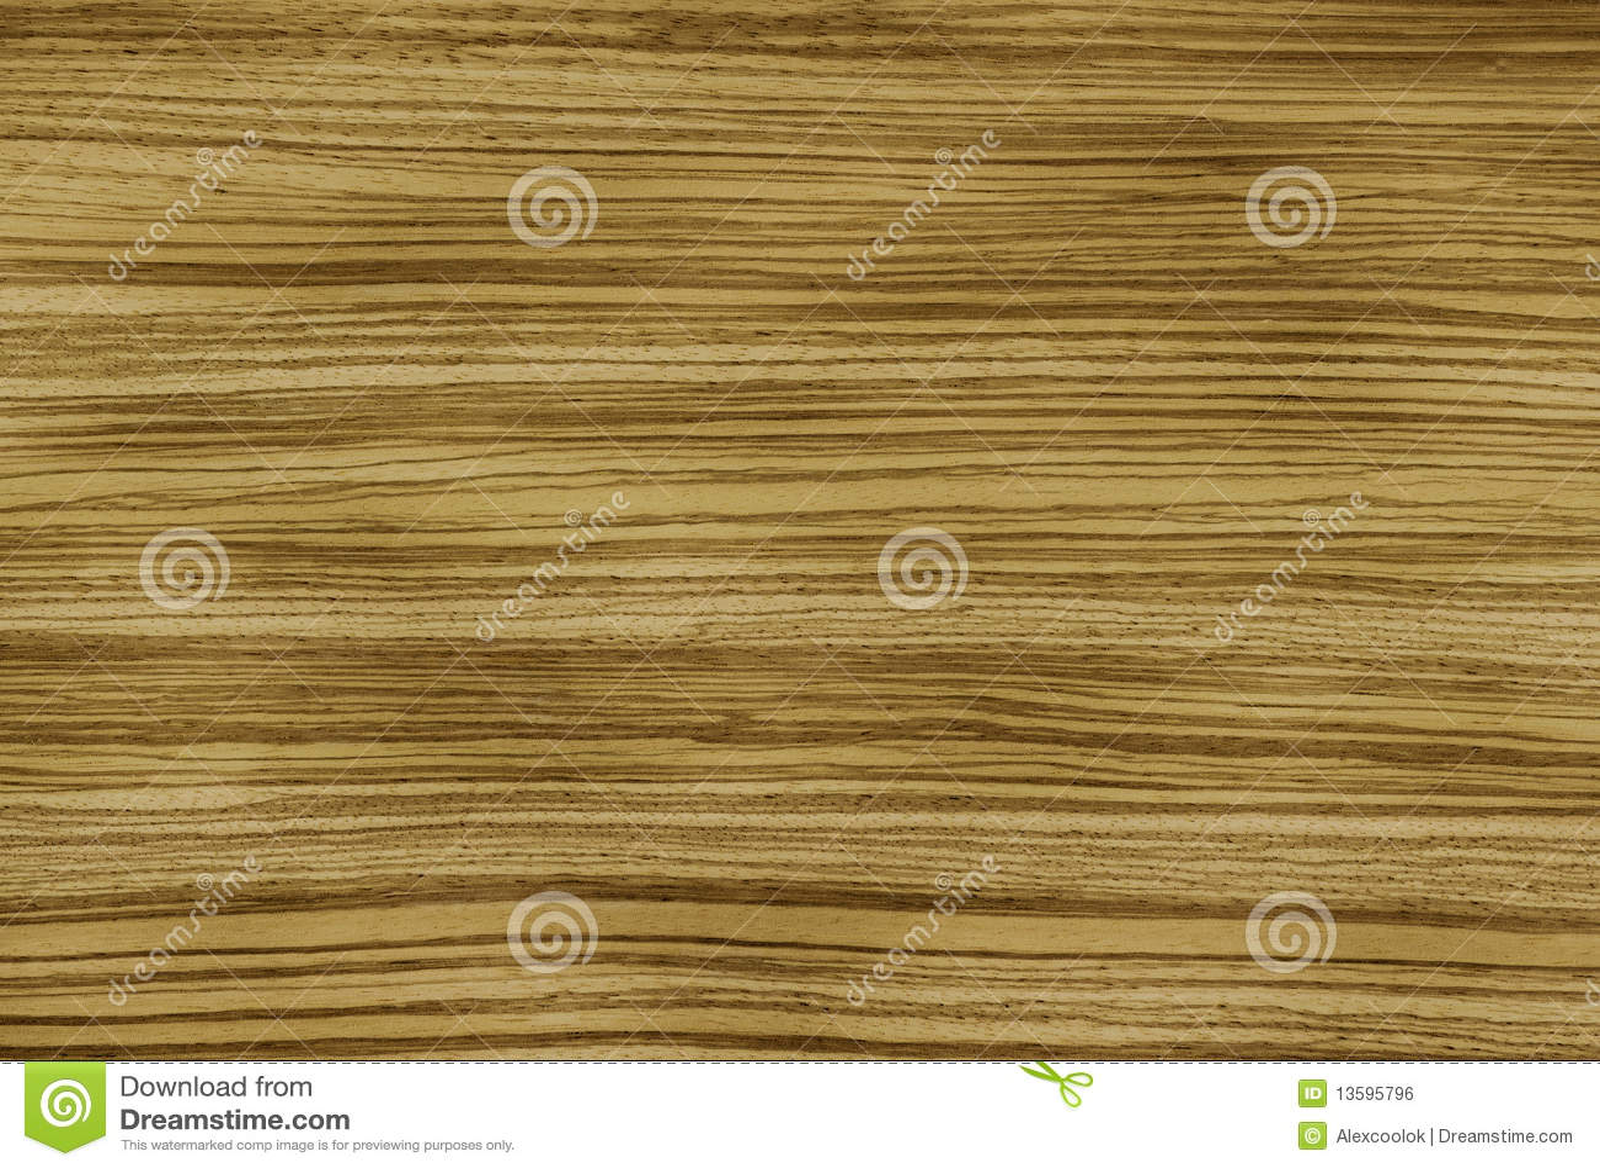 Zebrano Veneer Royalty Free Stock Image - Image: 13595796